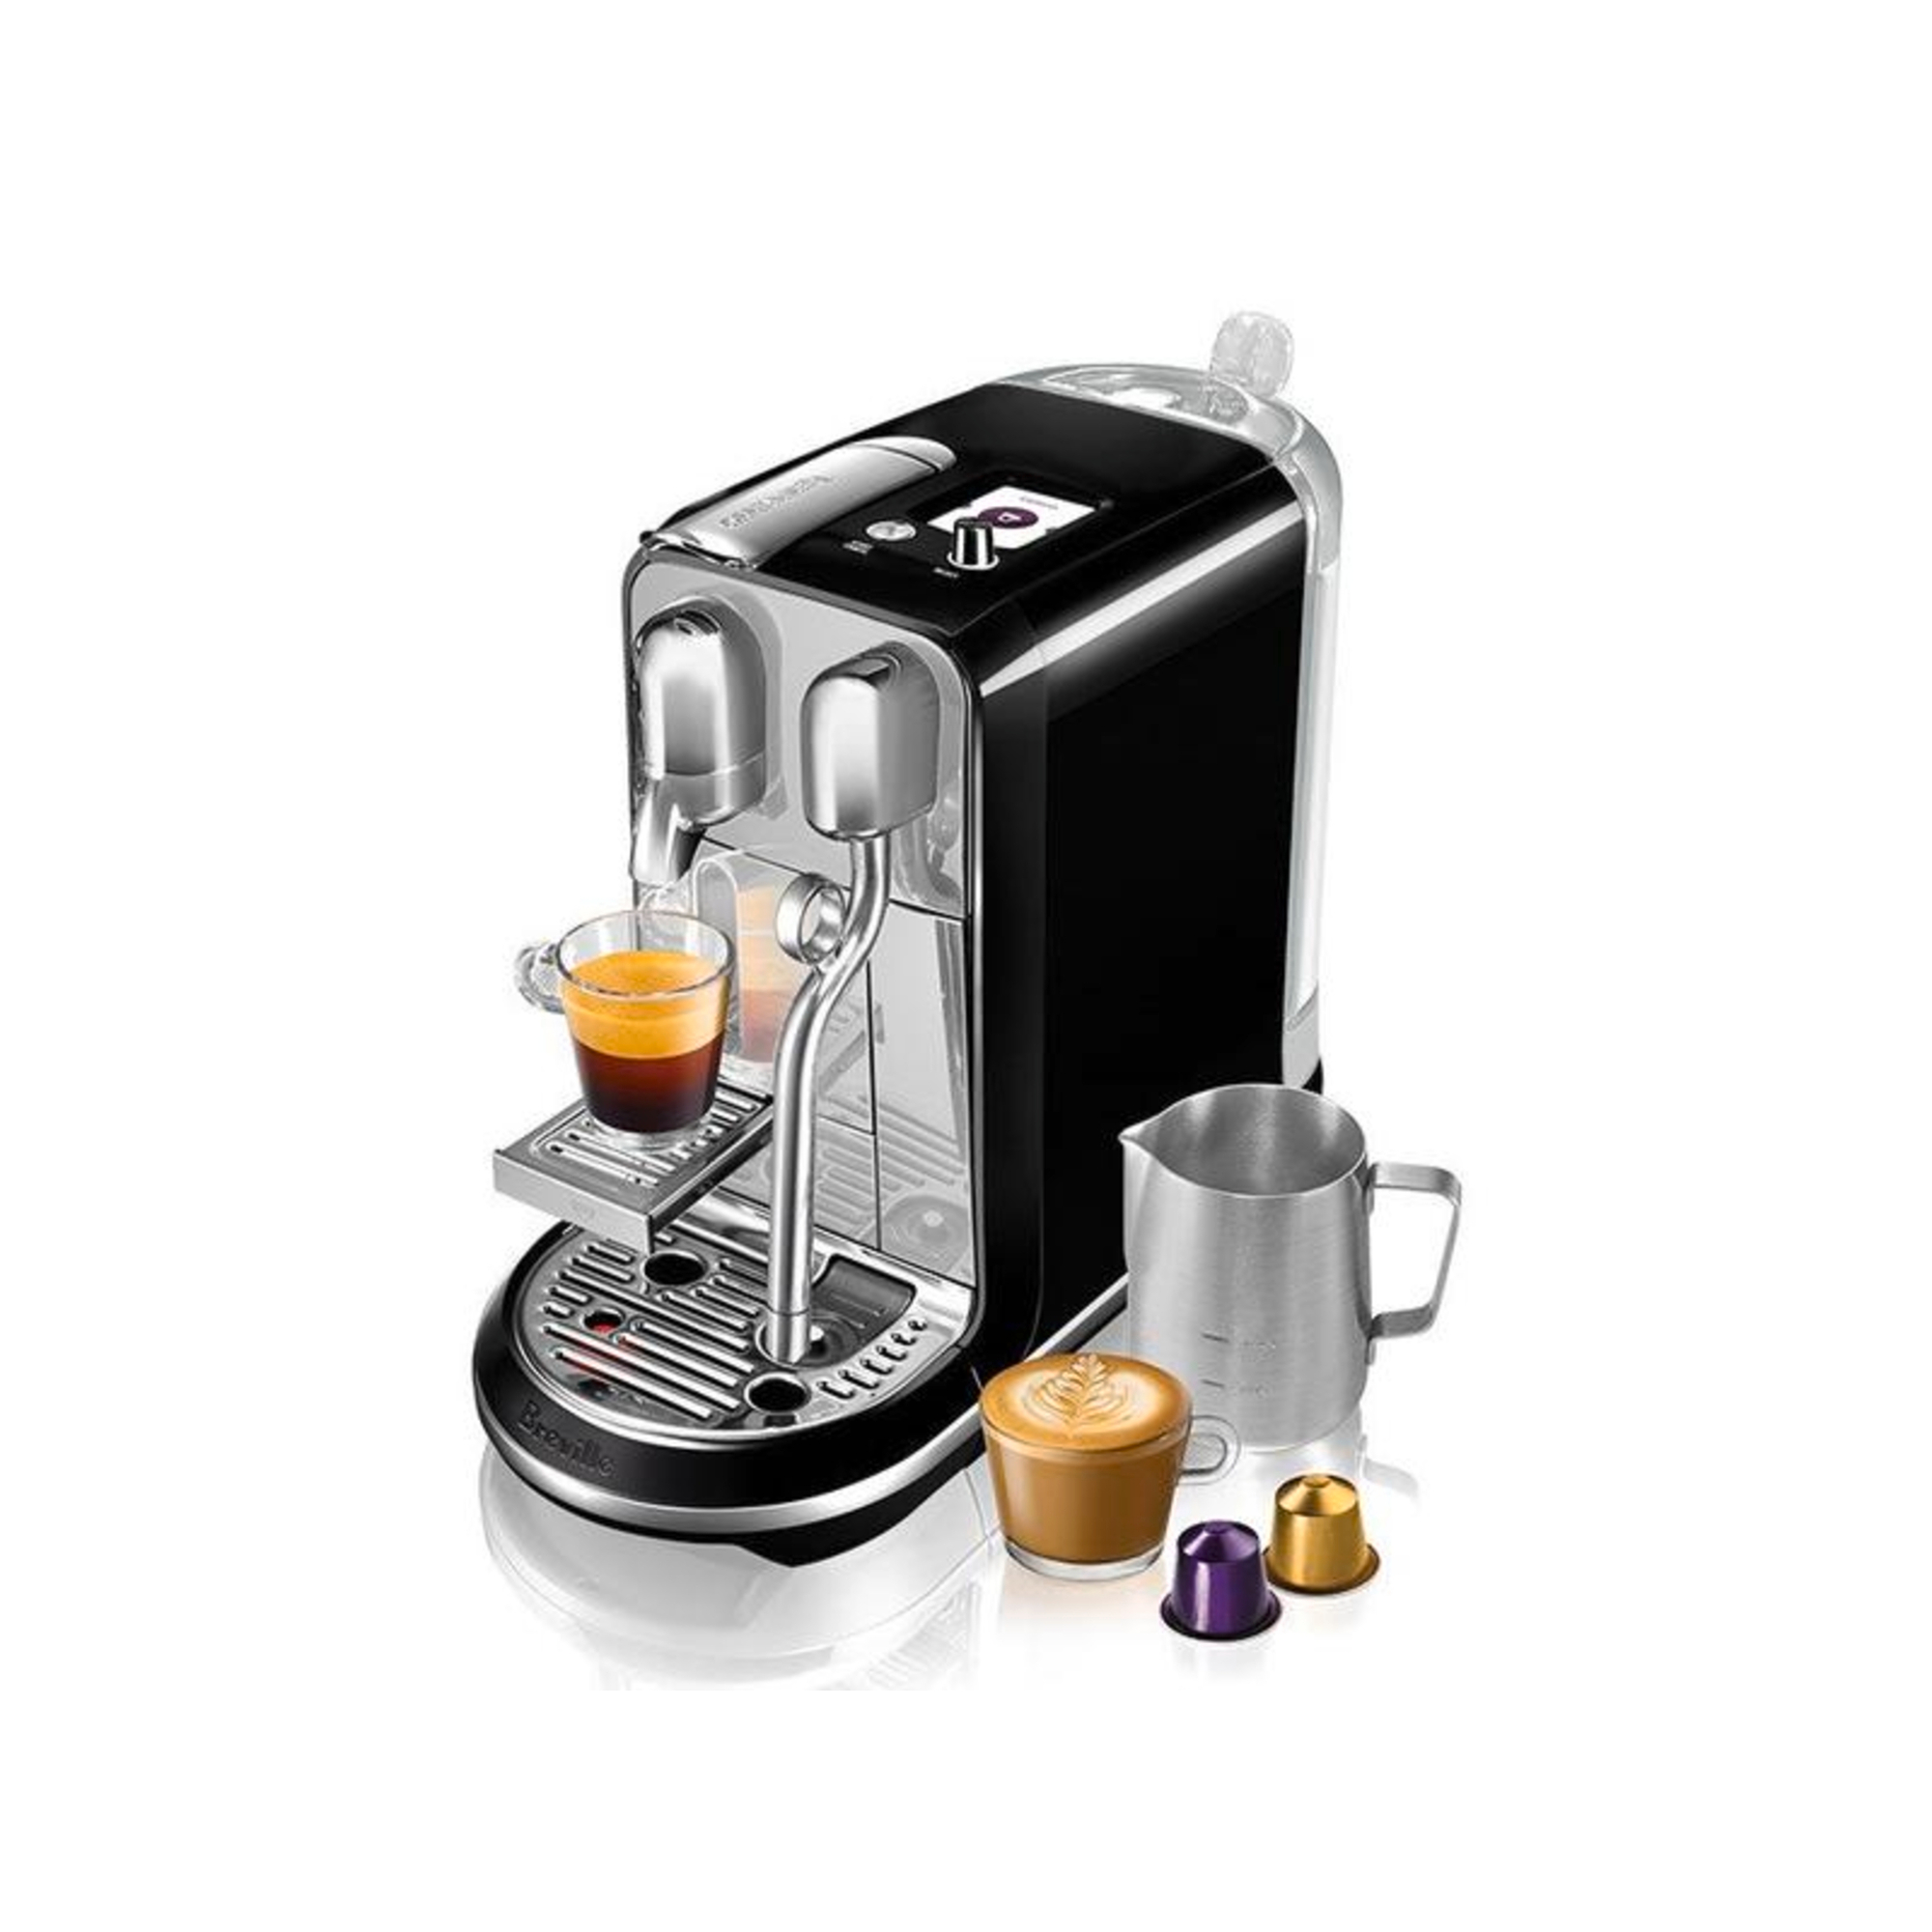 Breville Nespresso Creatista Salted Liquorice Espresso Machine